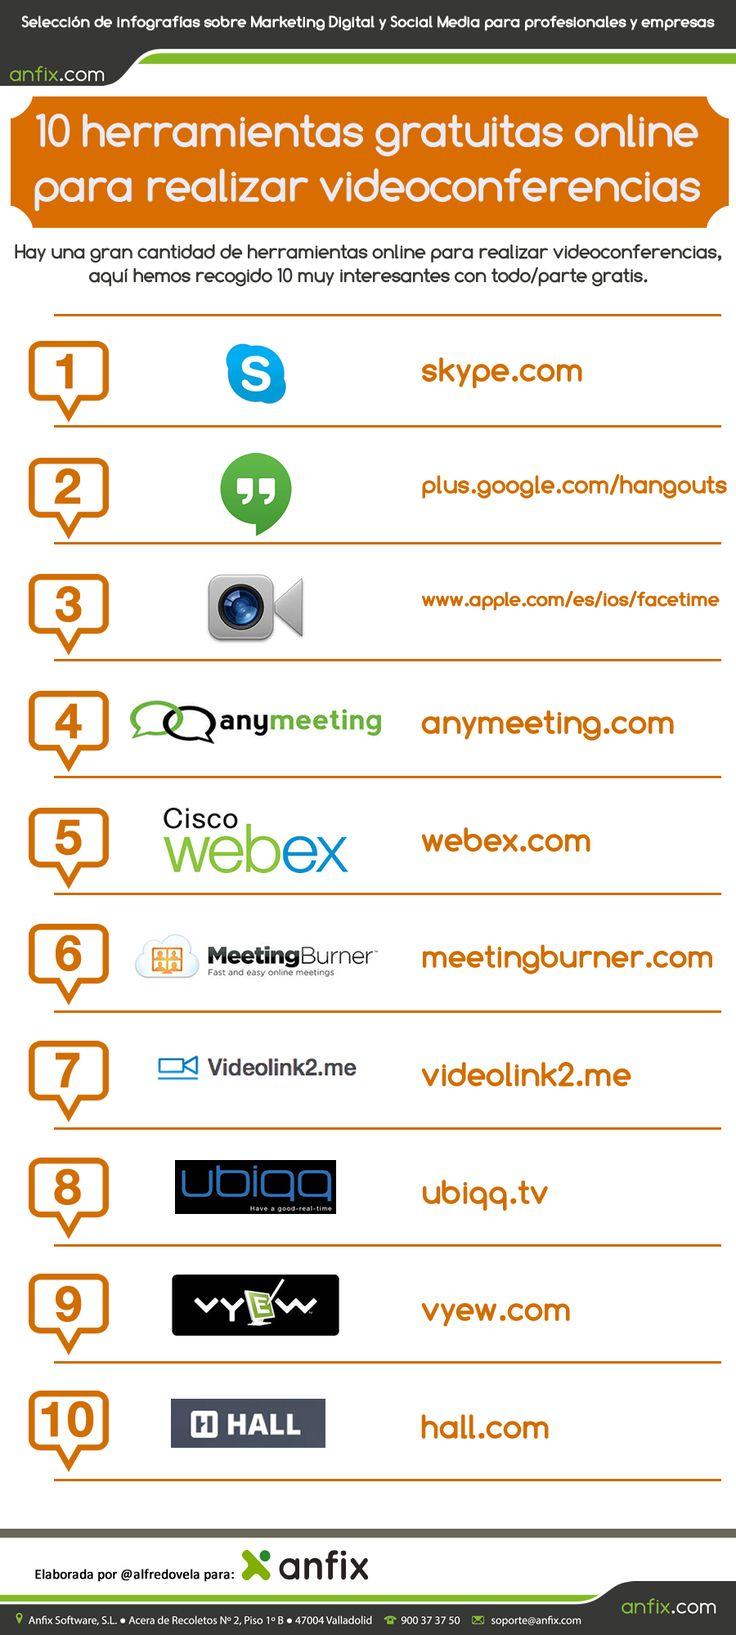 #Infografia 10 #Herramientas online gratuitas para realizar videoconferencias. #TAVnews